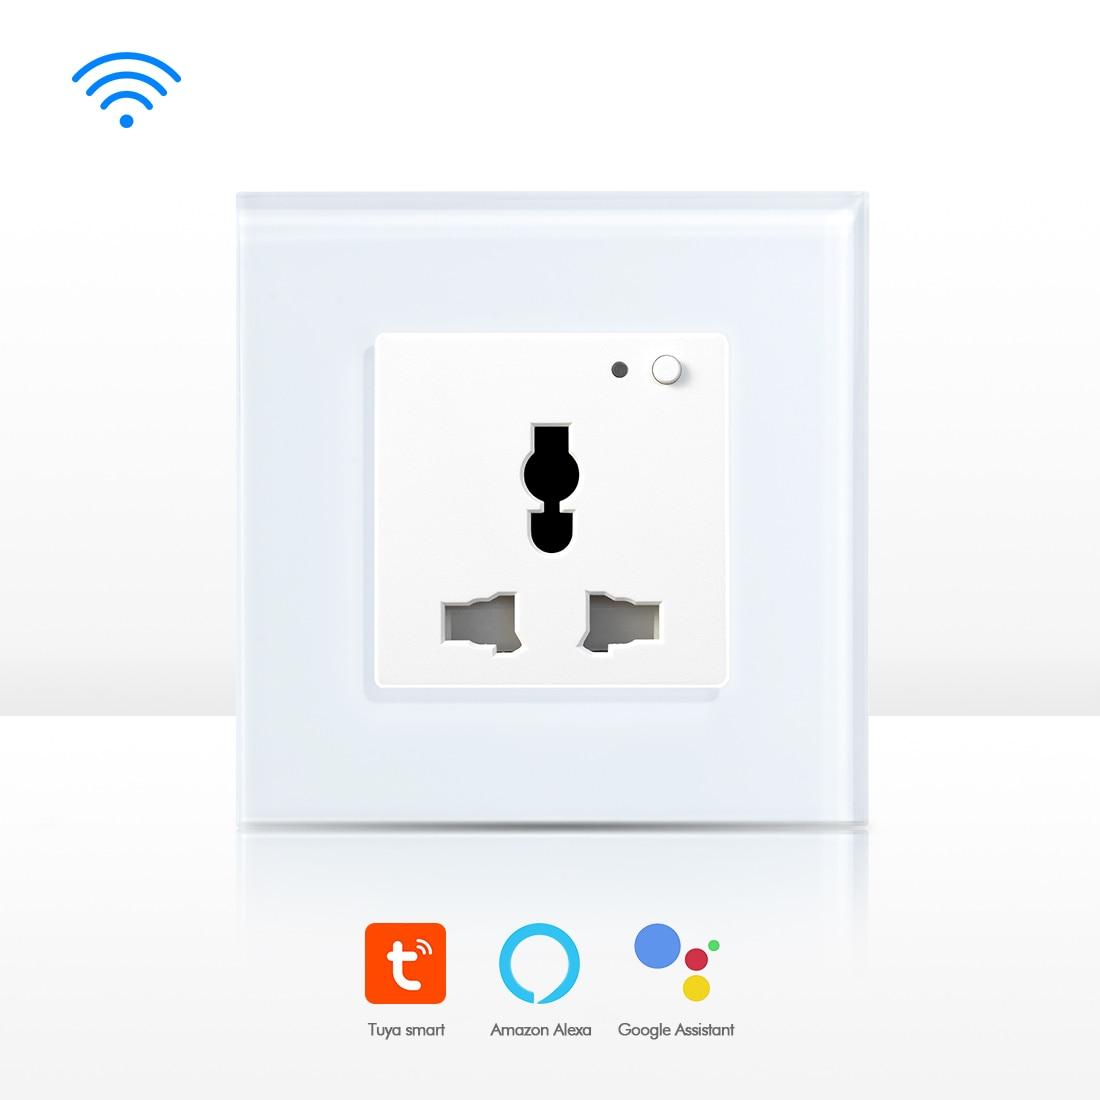 Prise de courant Wifi Multi prise murale prise de courant cristal 13A noir or blancPrise de courant Wifi Multi prise murale prise de courant cristal 13A noir or blanc